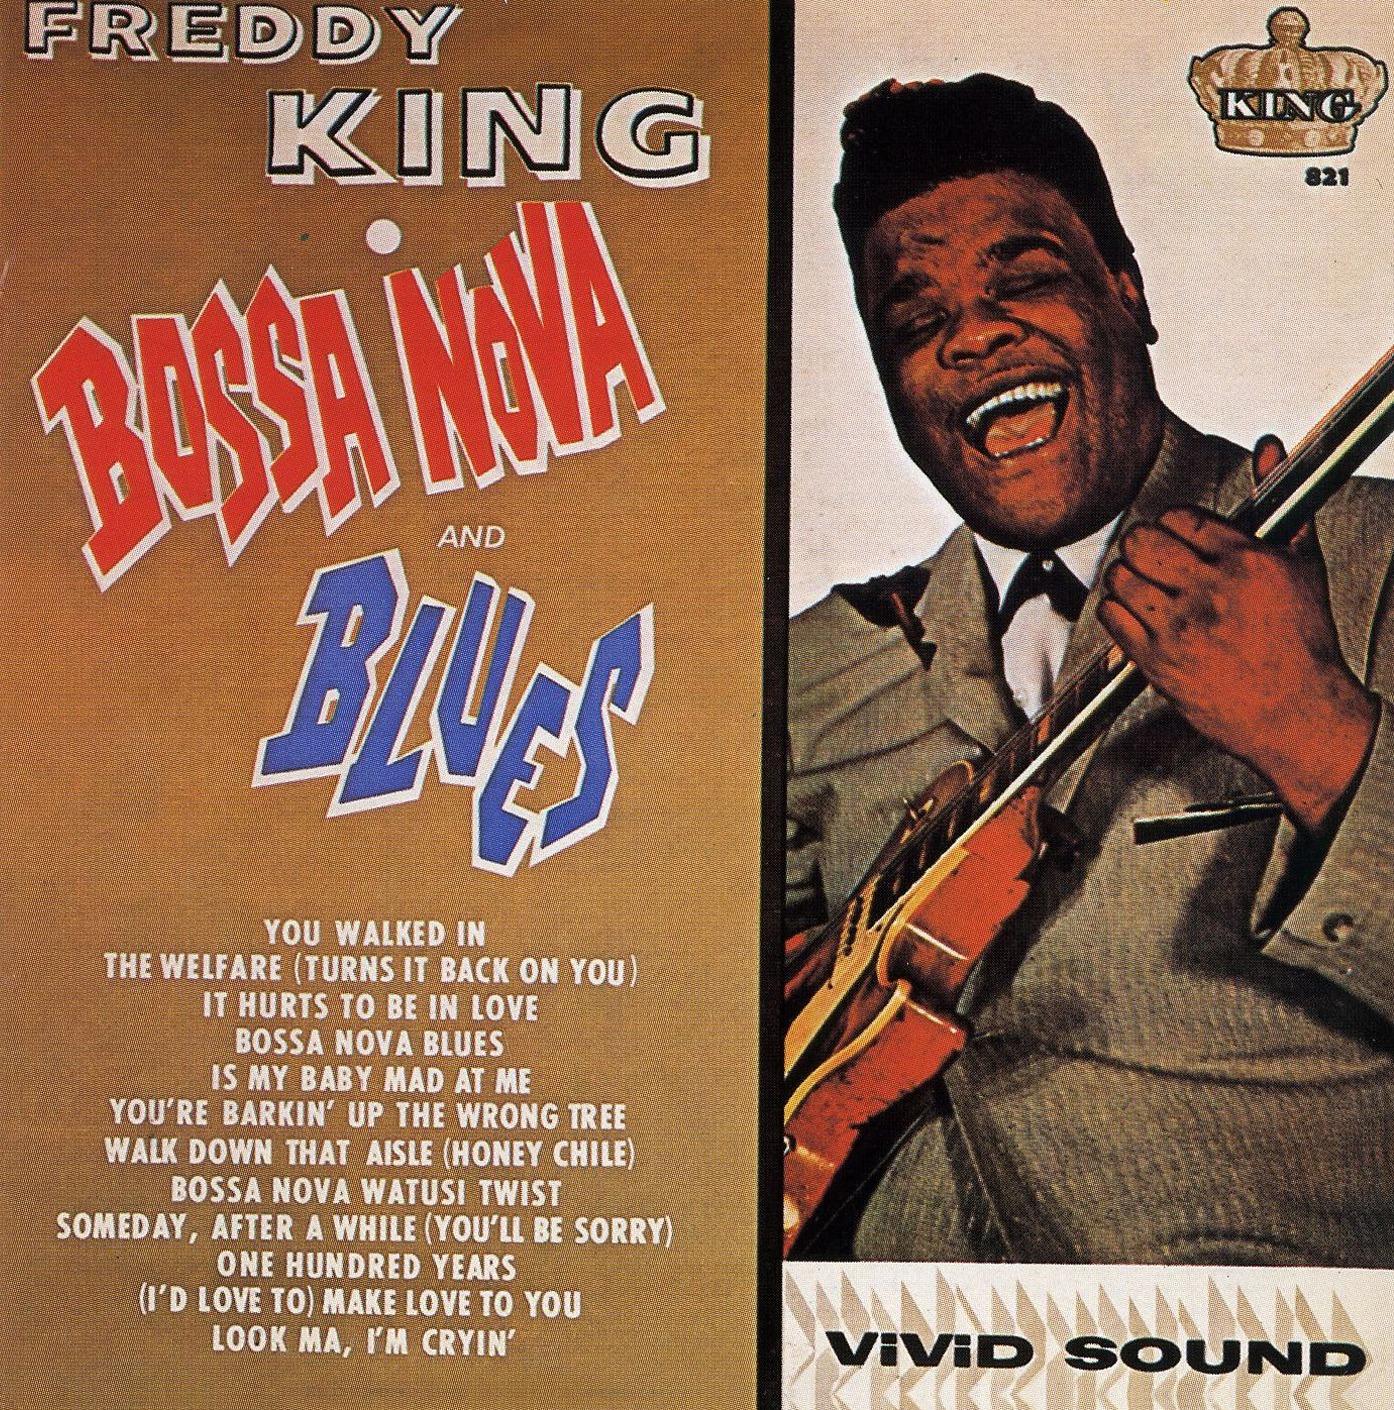 Music Archive: Freddy King - Bossa Nova & Blues (1963)